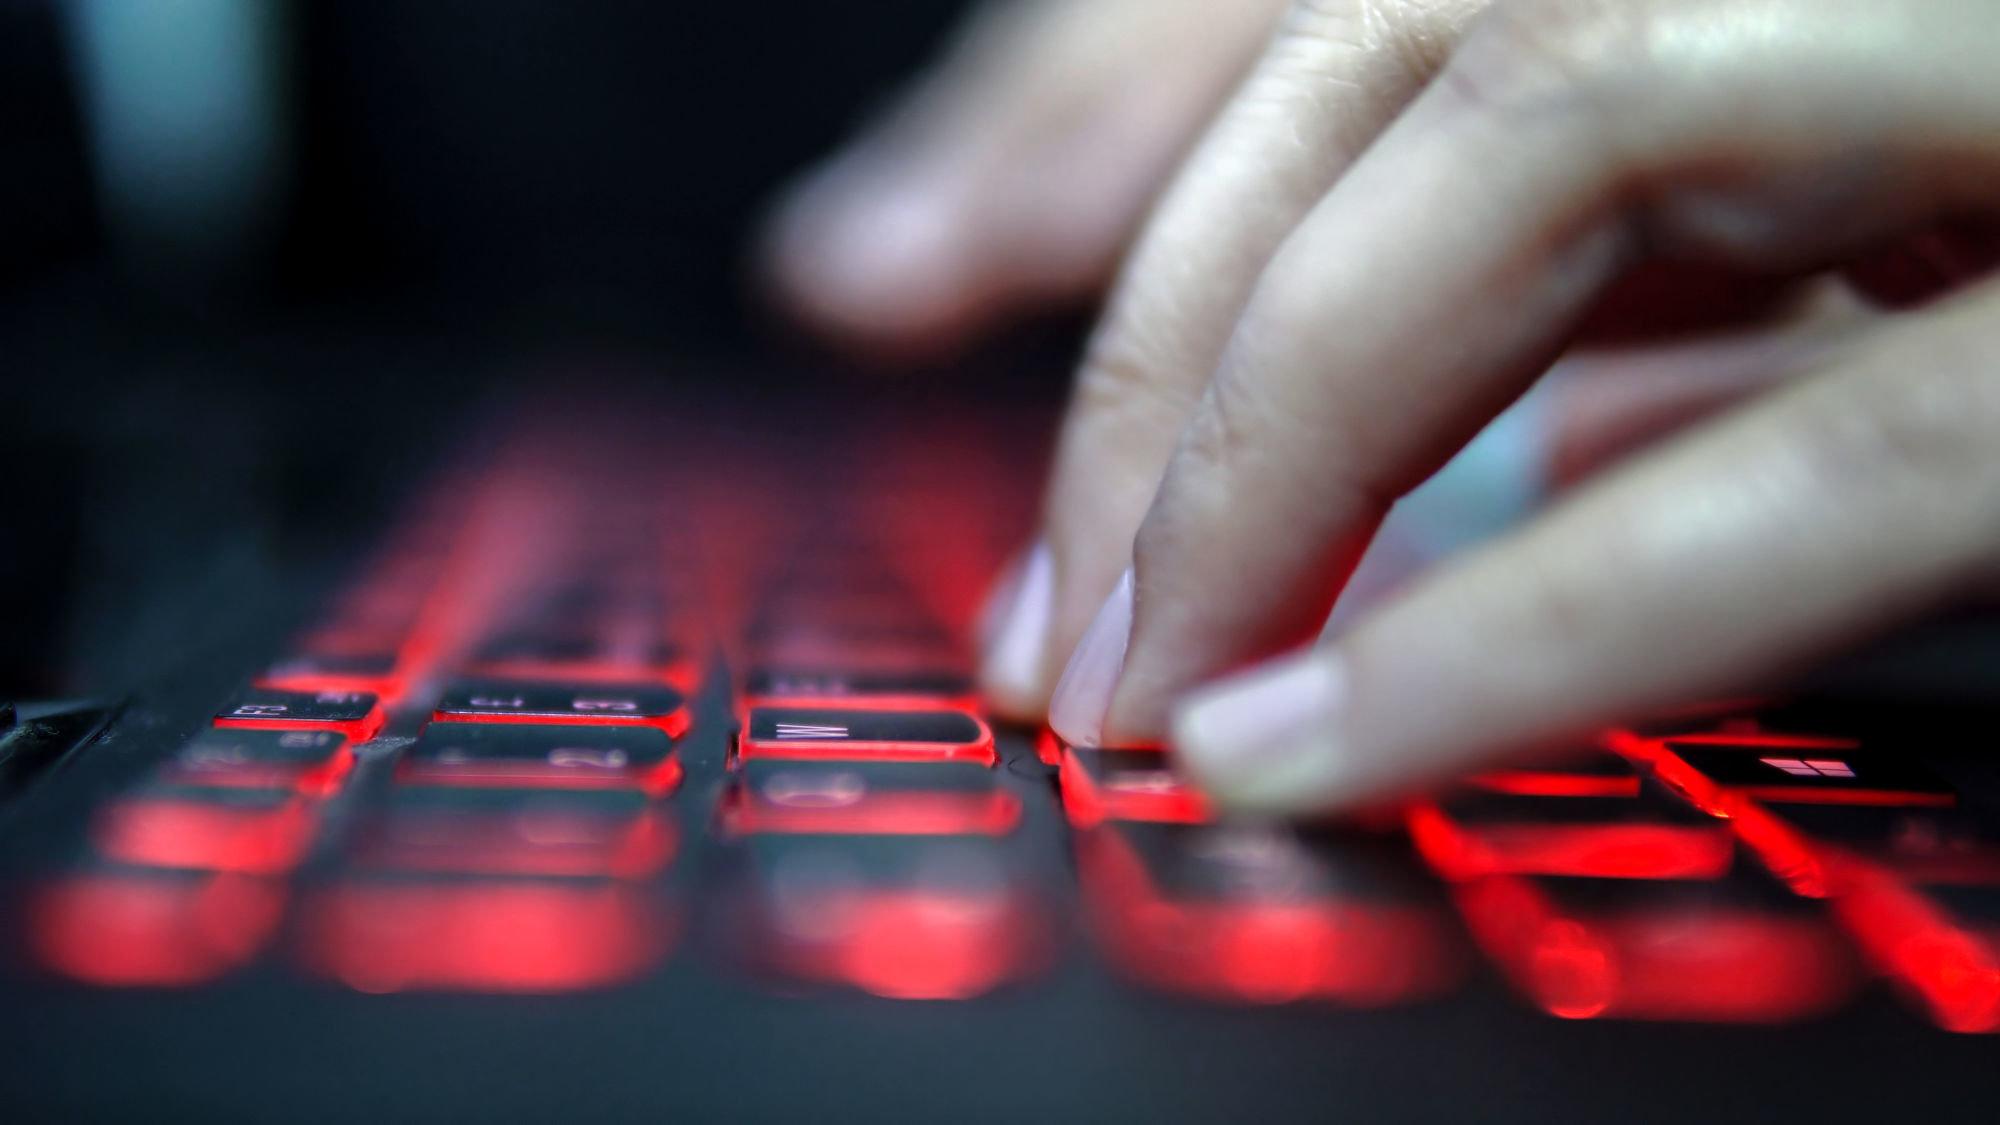 XKCD论坛泄露超过56万个用户帐户的详细信息